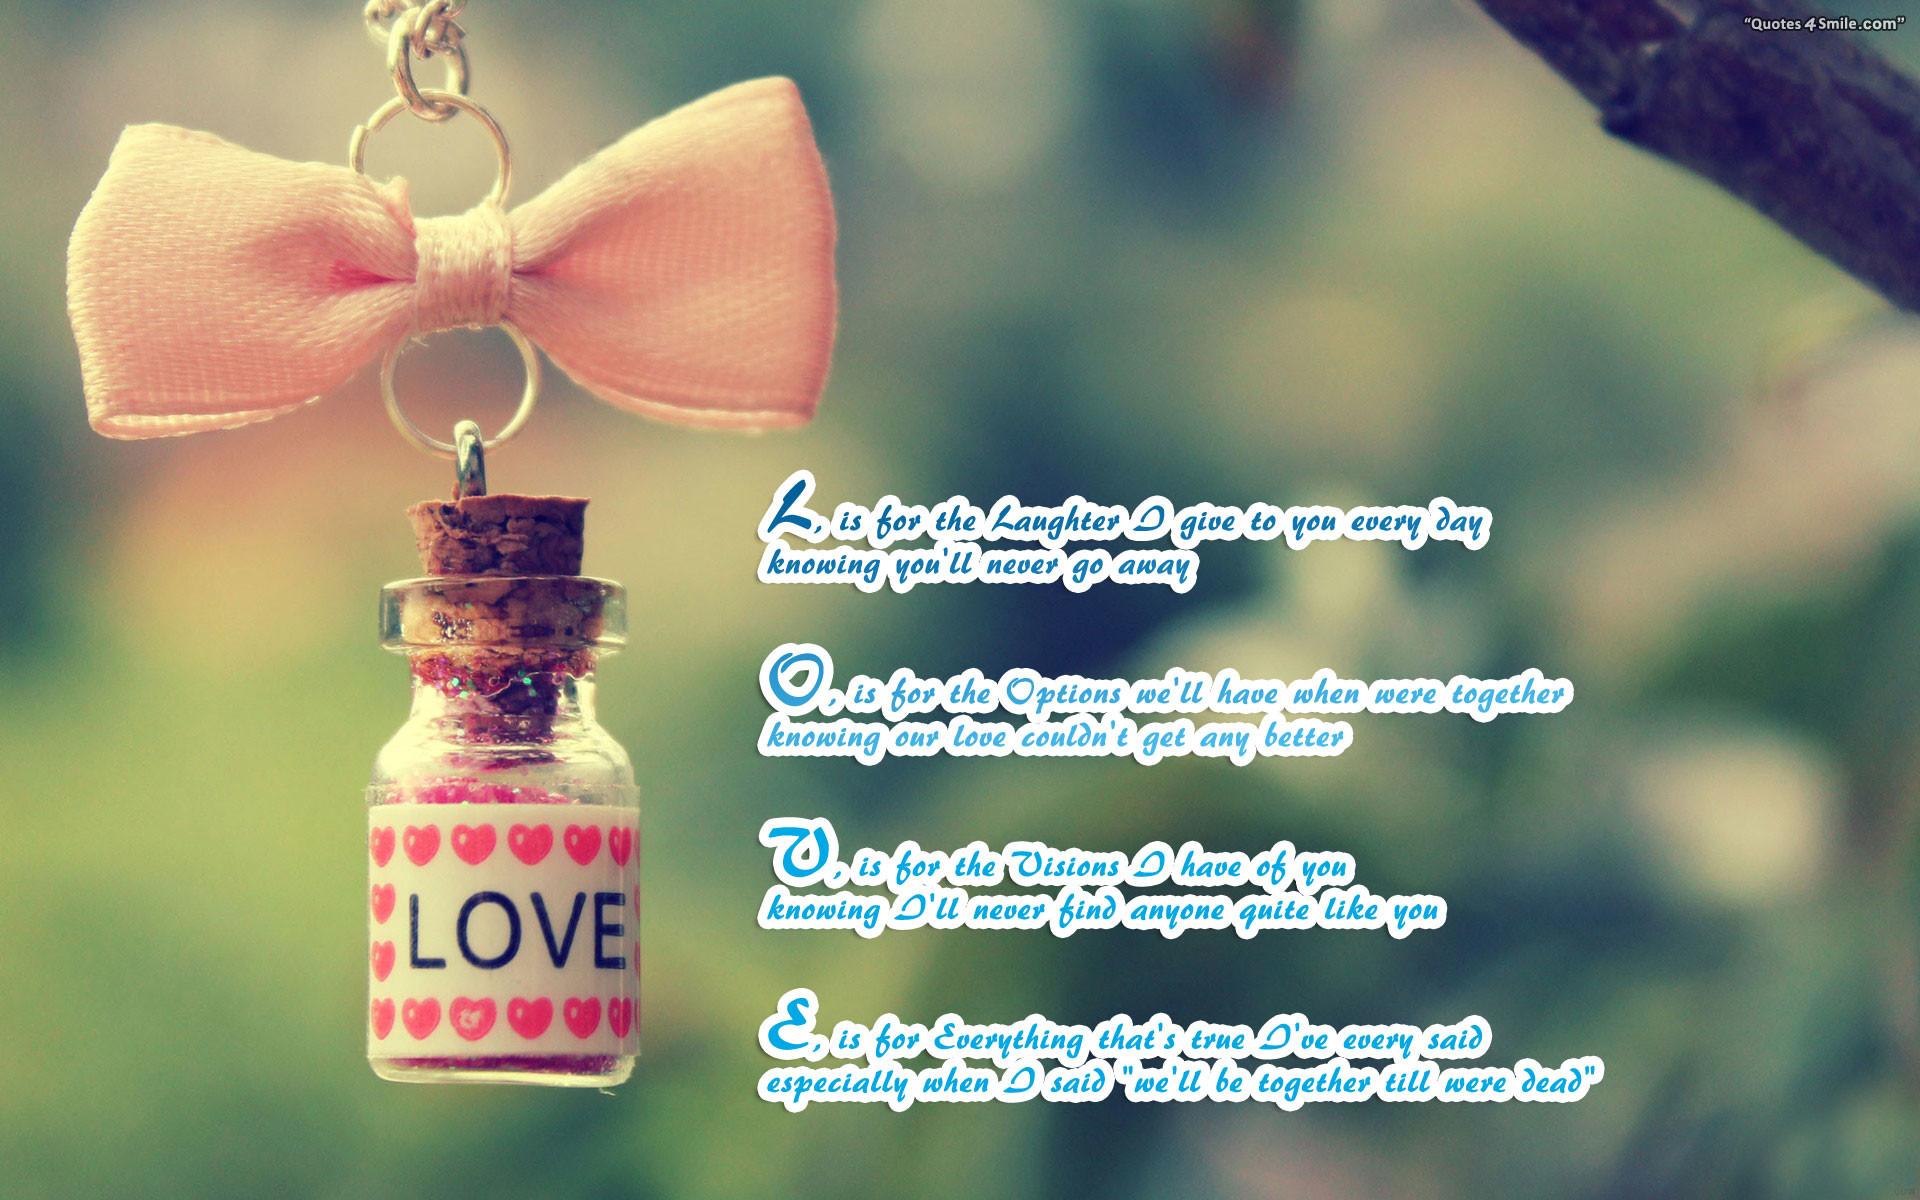 Love Wallpaper For Tablet: True Love Wallpaper (58+ Images